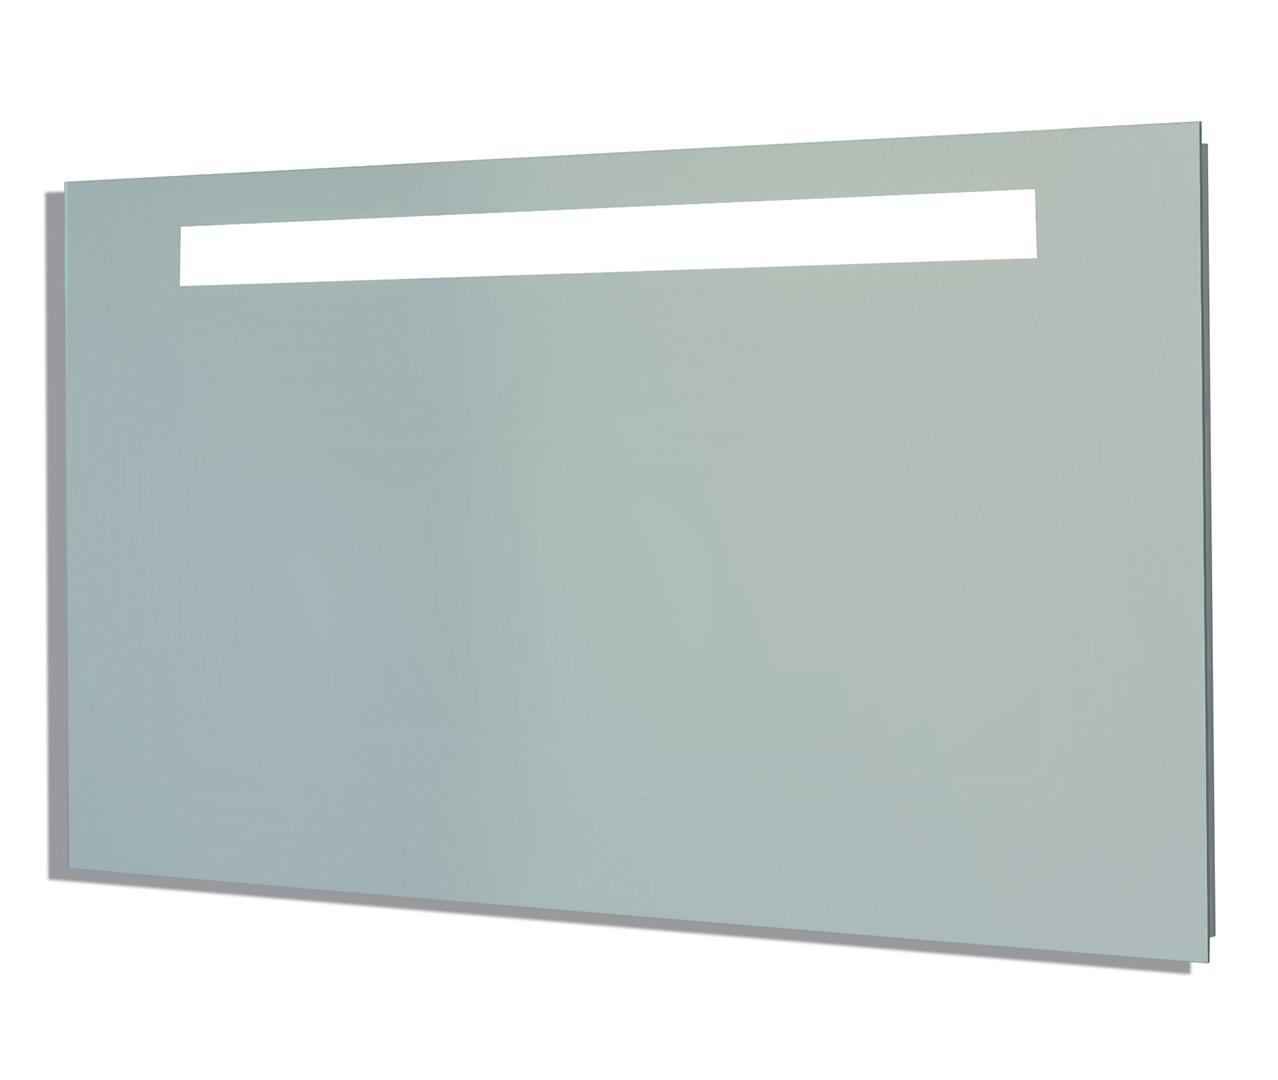 Spiegel Op Maat Gamma.Gamma Reflet Spiegels Badkamerspiegel Sanijura